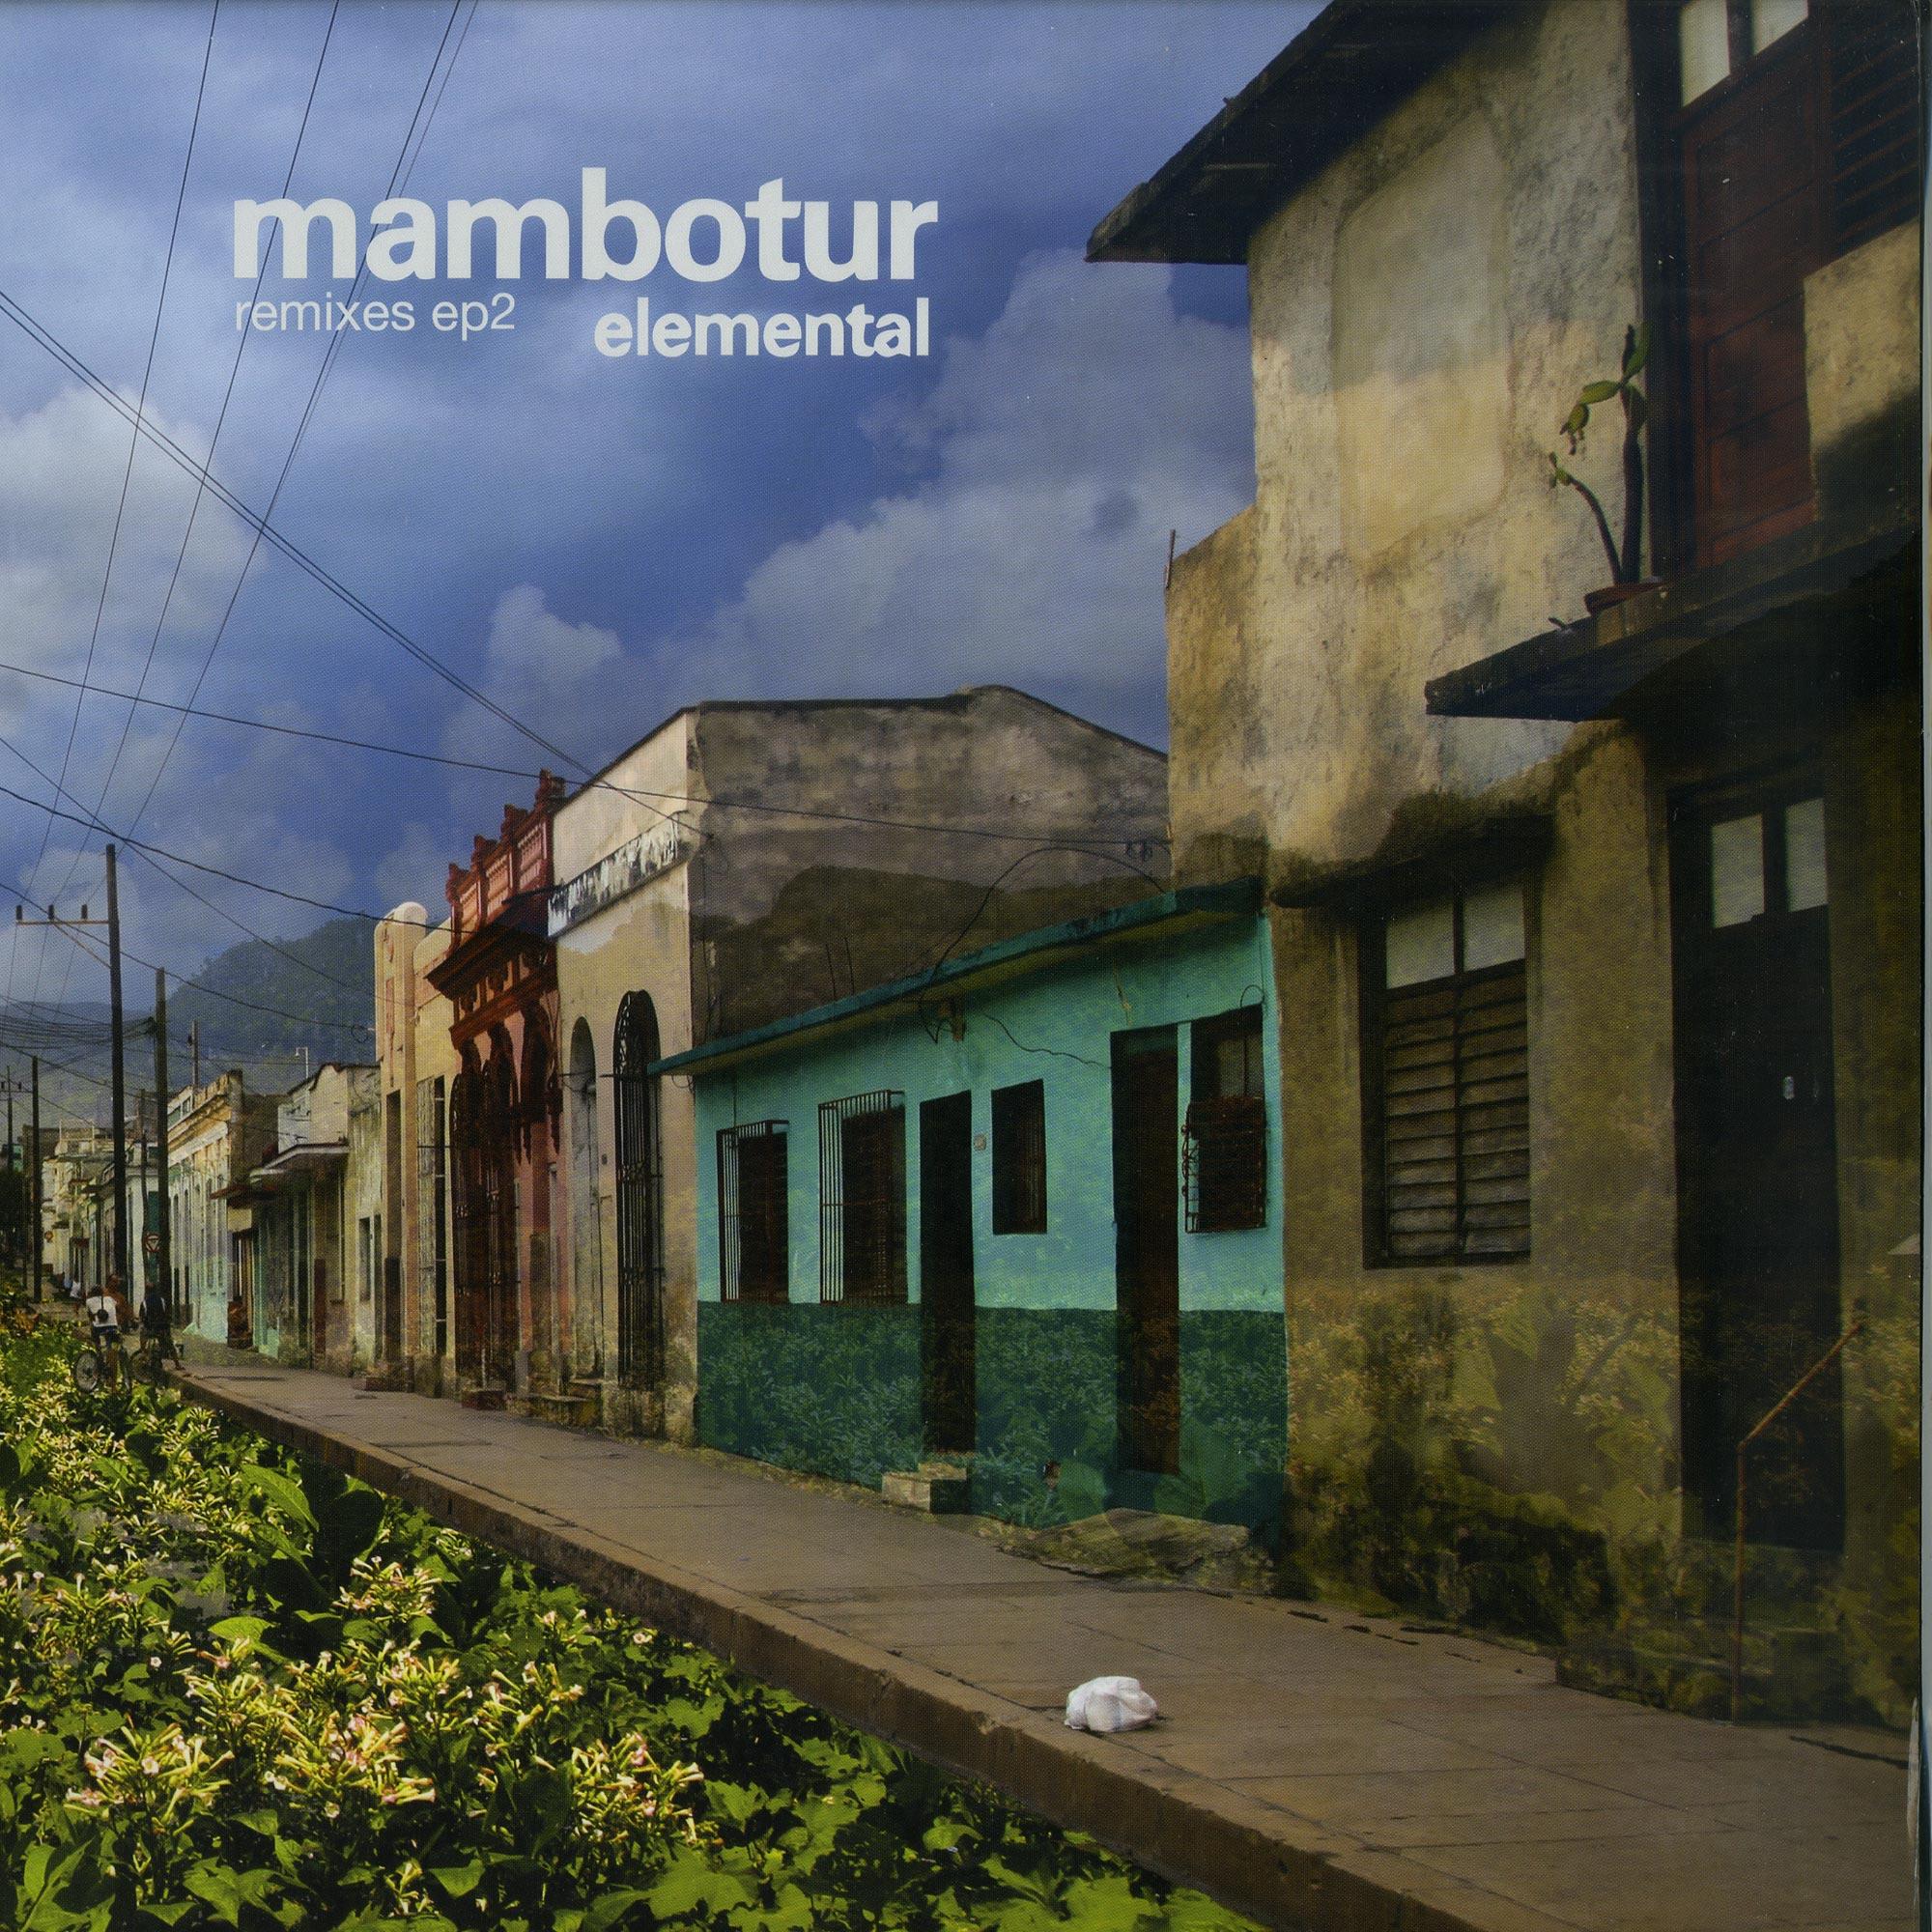 Mambotur - ELEMENTAL REMIXES PART 2 BY CAB DRIVERS, LUC RINGEISEN, DAP